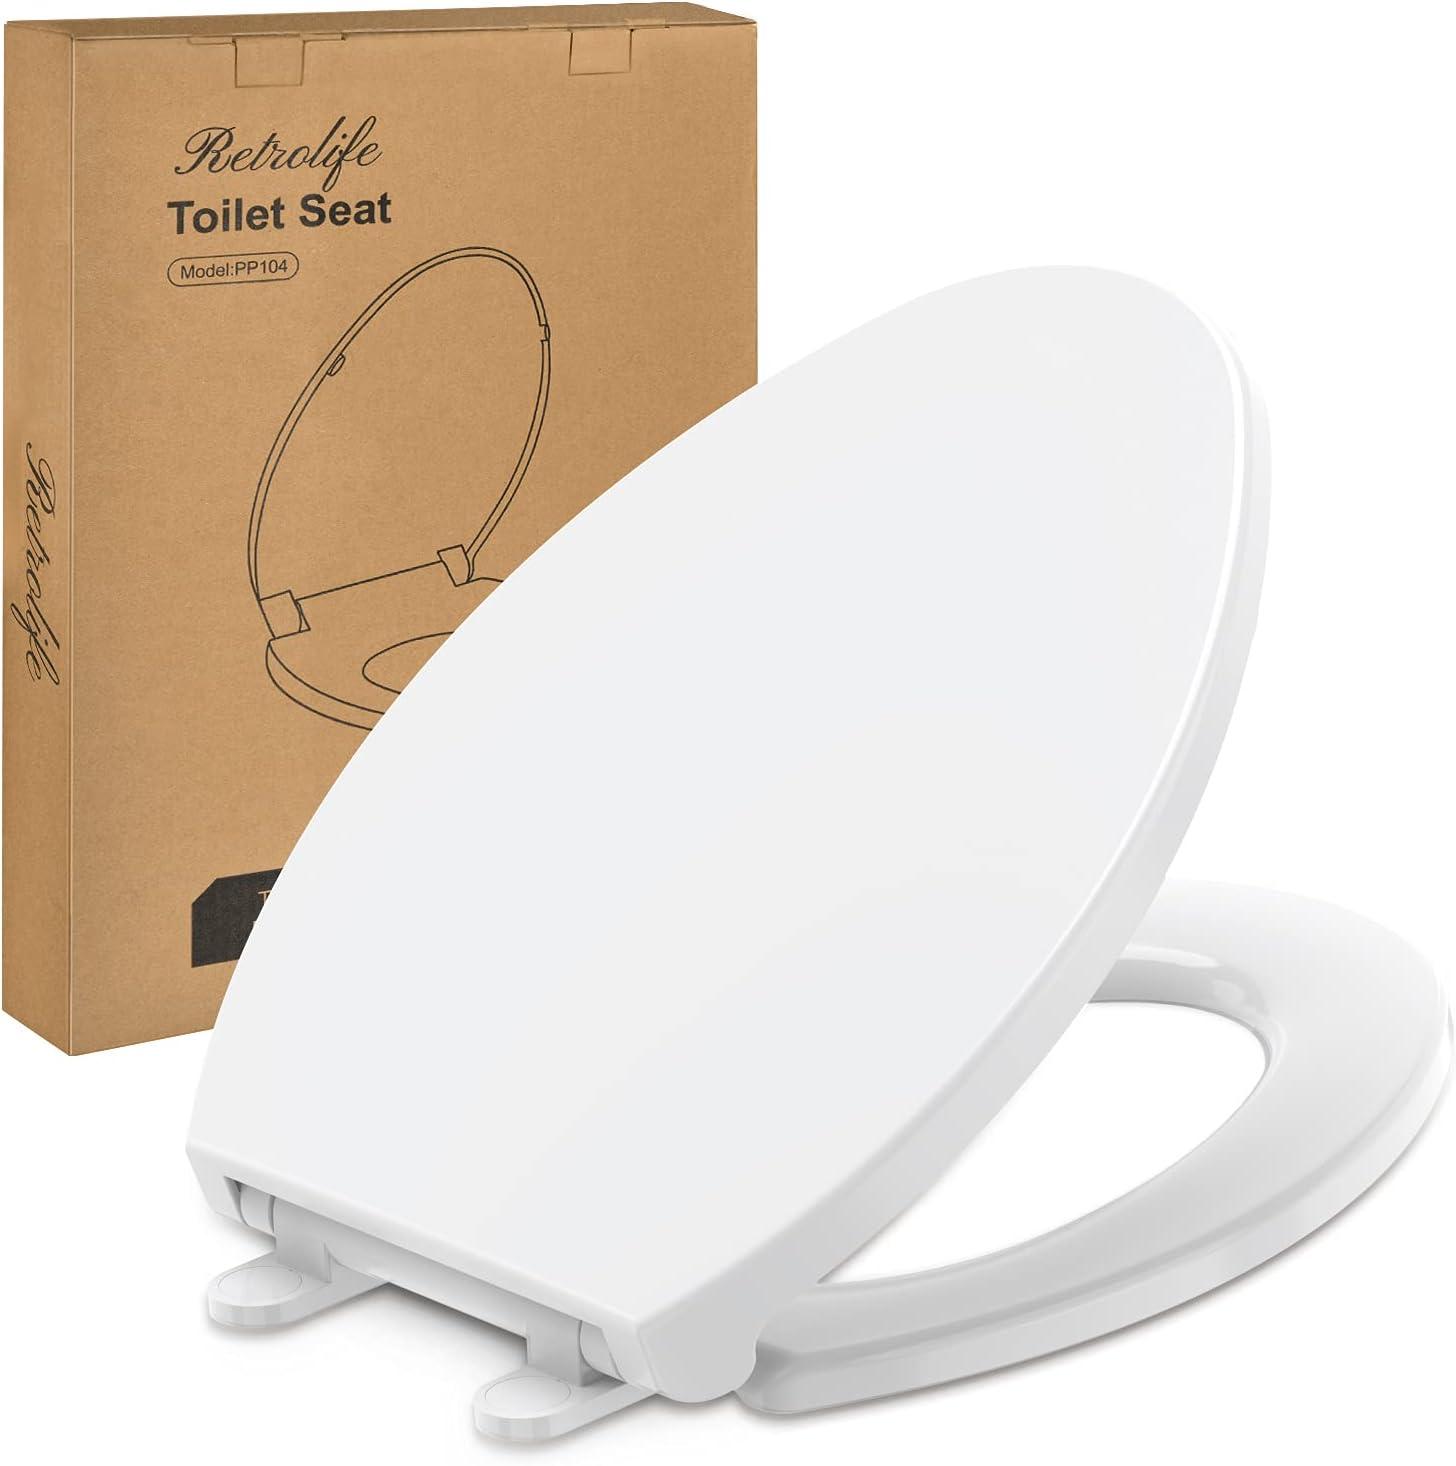 Retrolife Elongated Soft Close Toilet Seat $19.99 Coupon